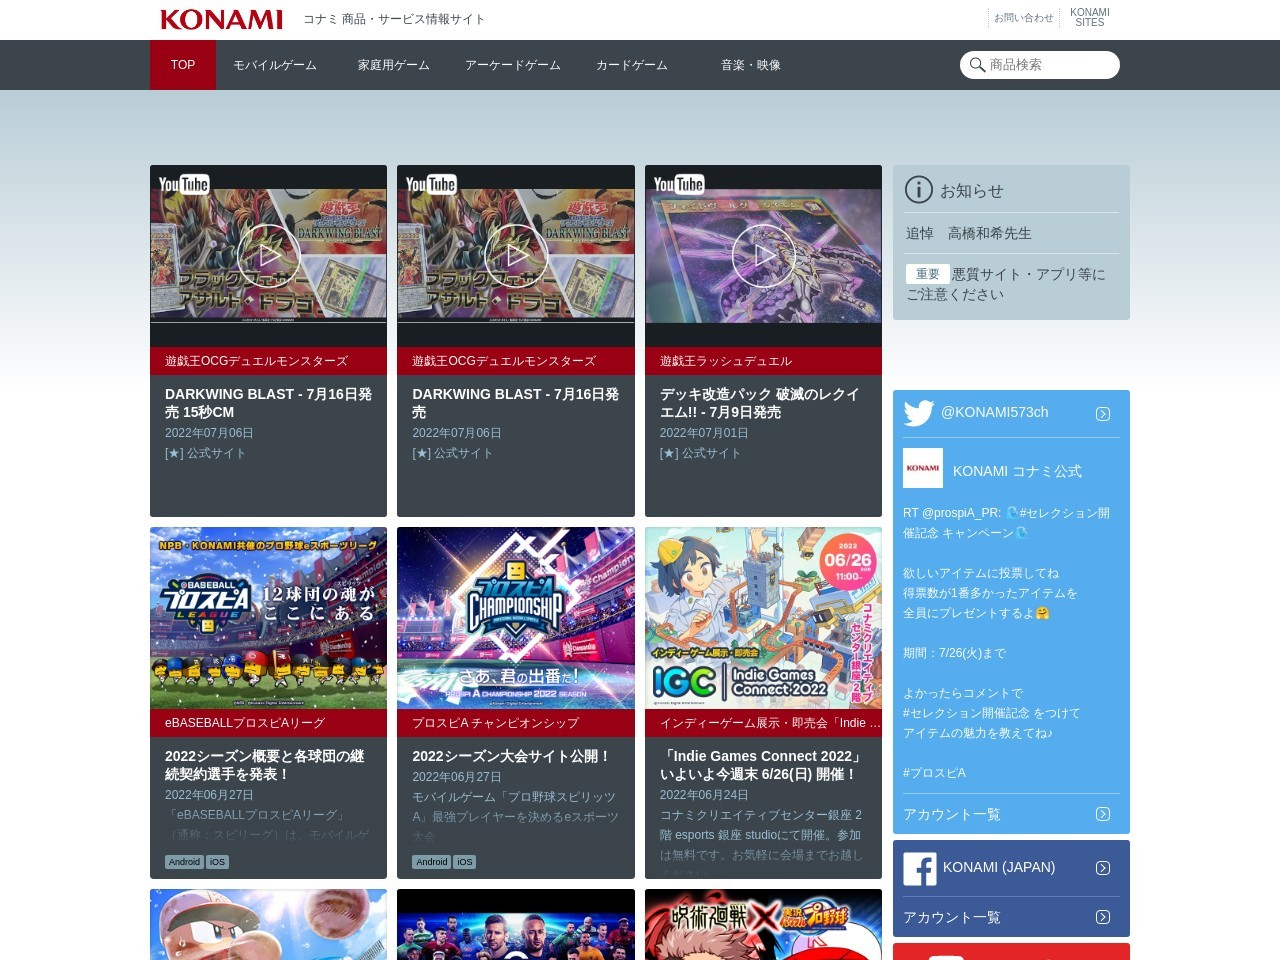 http://www.konami.jp/mgs5/gz/jp/index.php5